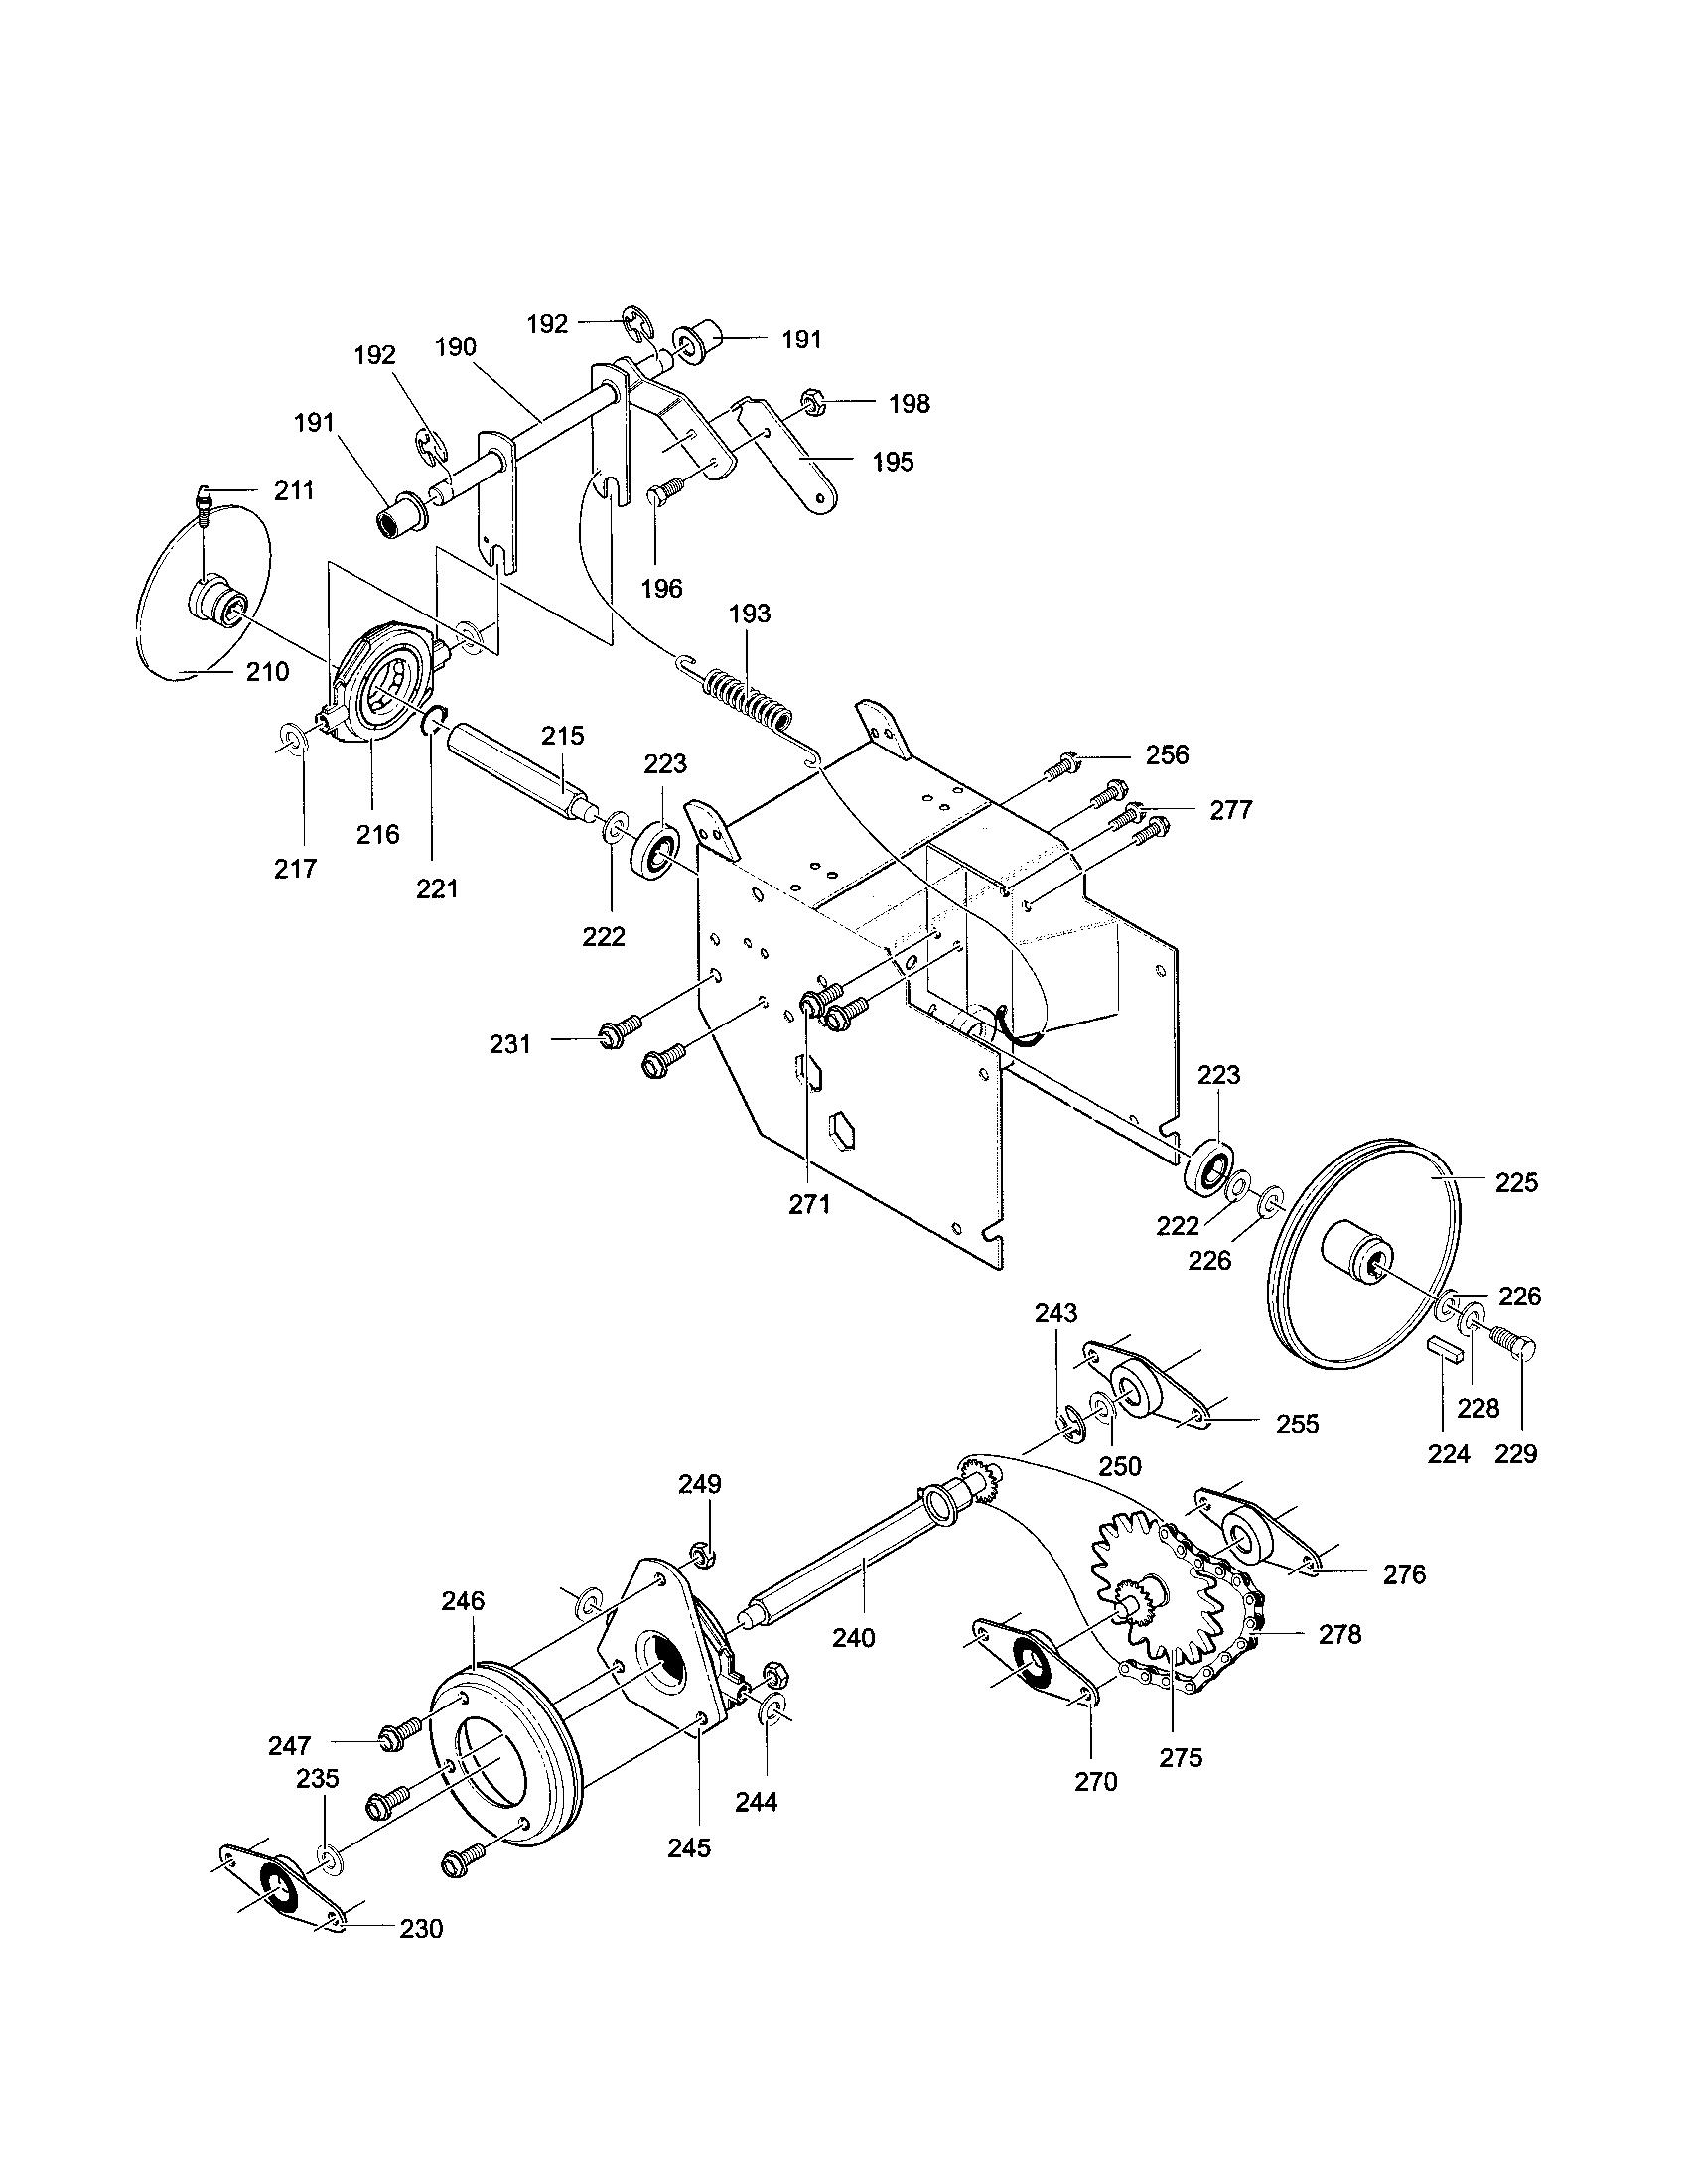 Craftsman model C950-52005-0 snowthrower, gas genuine parts